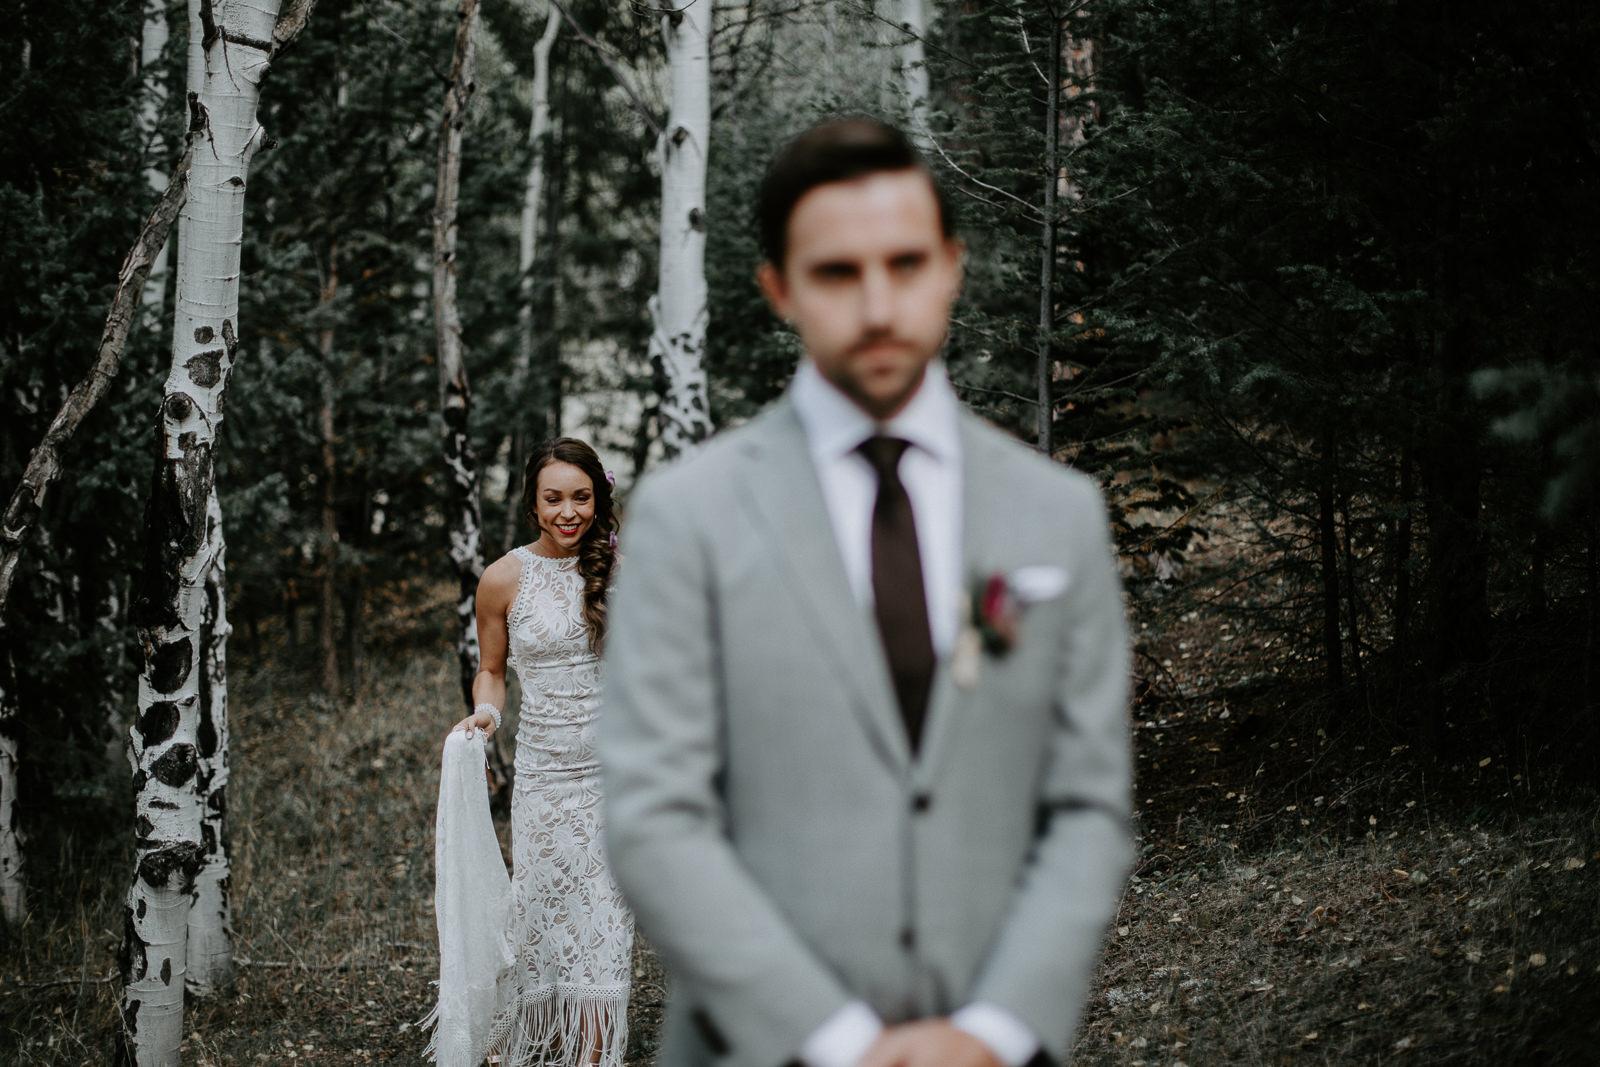 Bride in lacy white dress in focus behind groom blurred